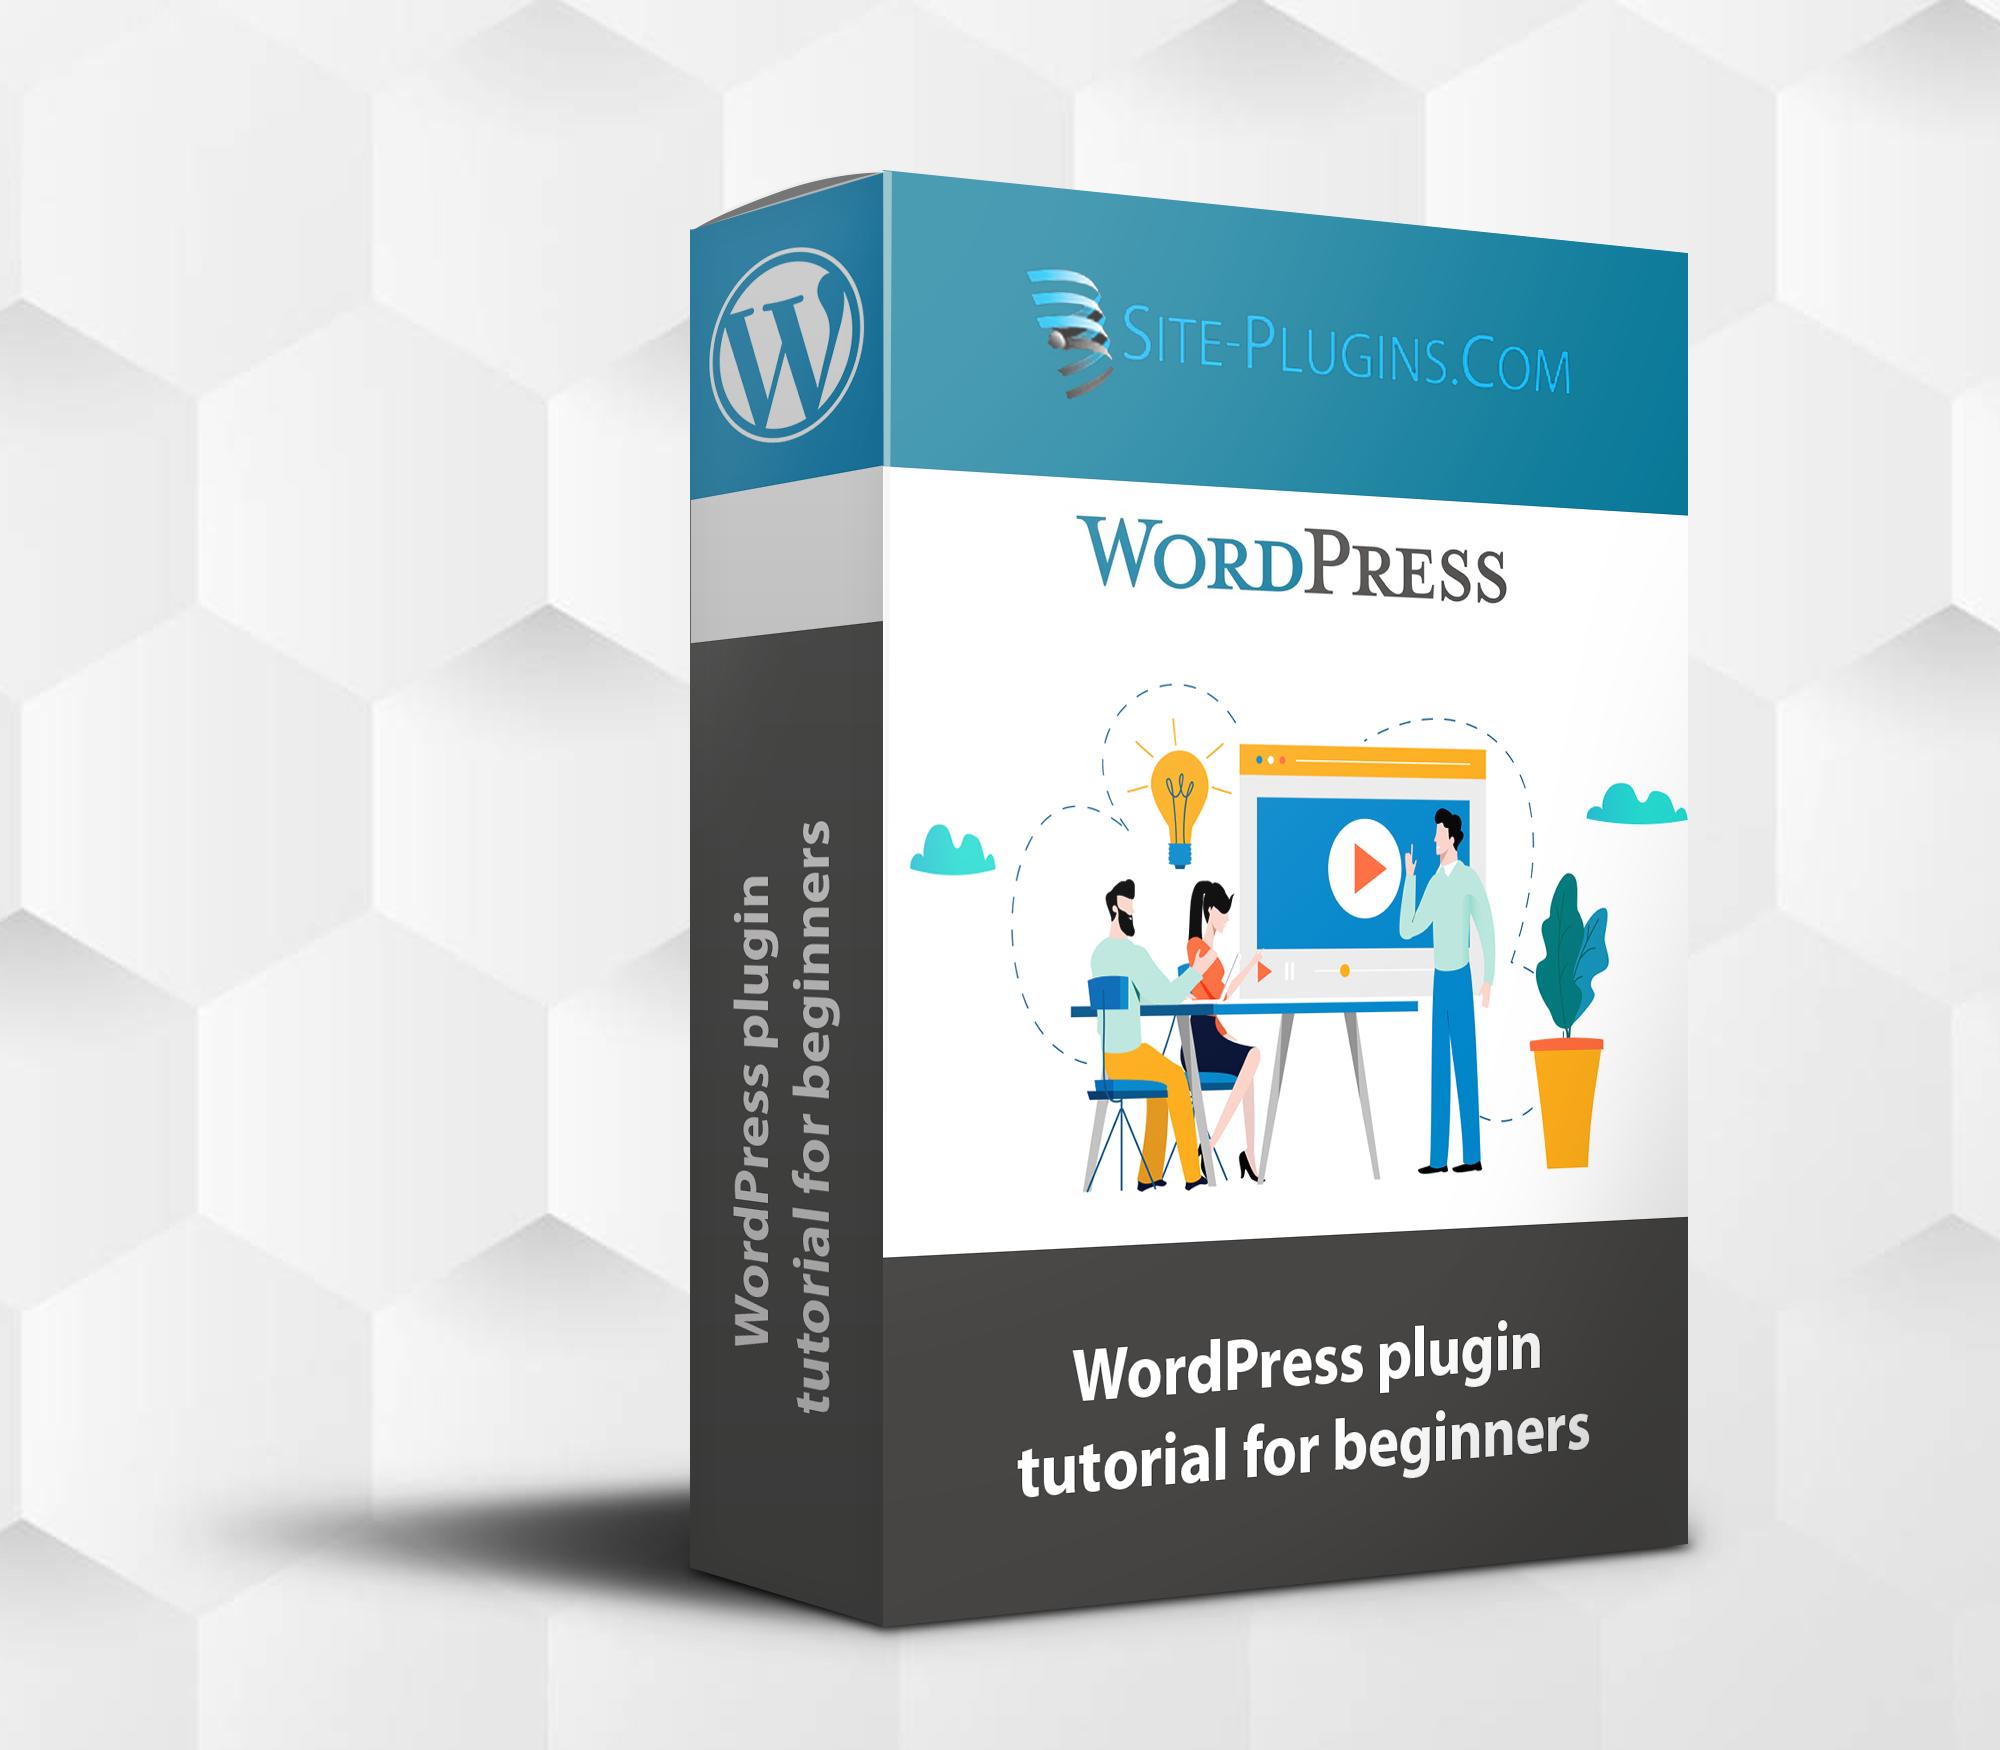 wordpress plugin tutorial form beginners